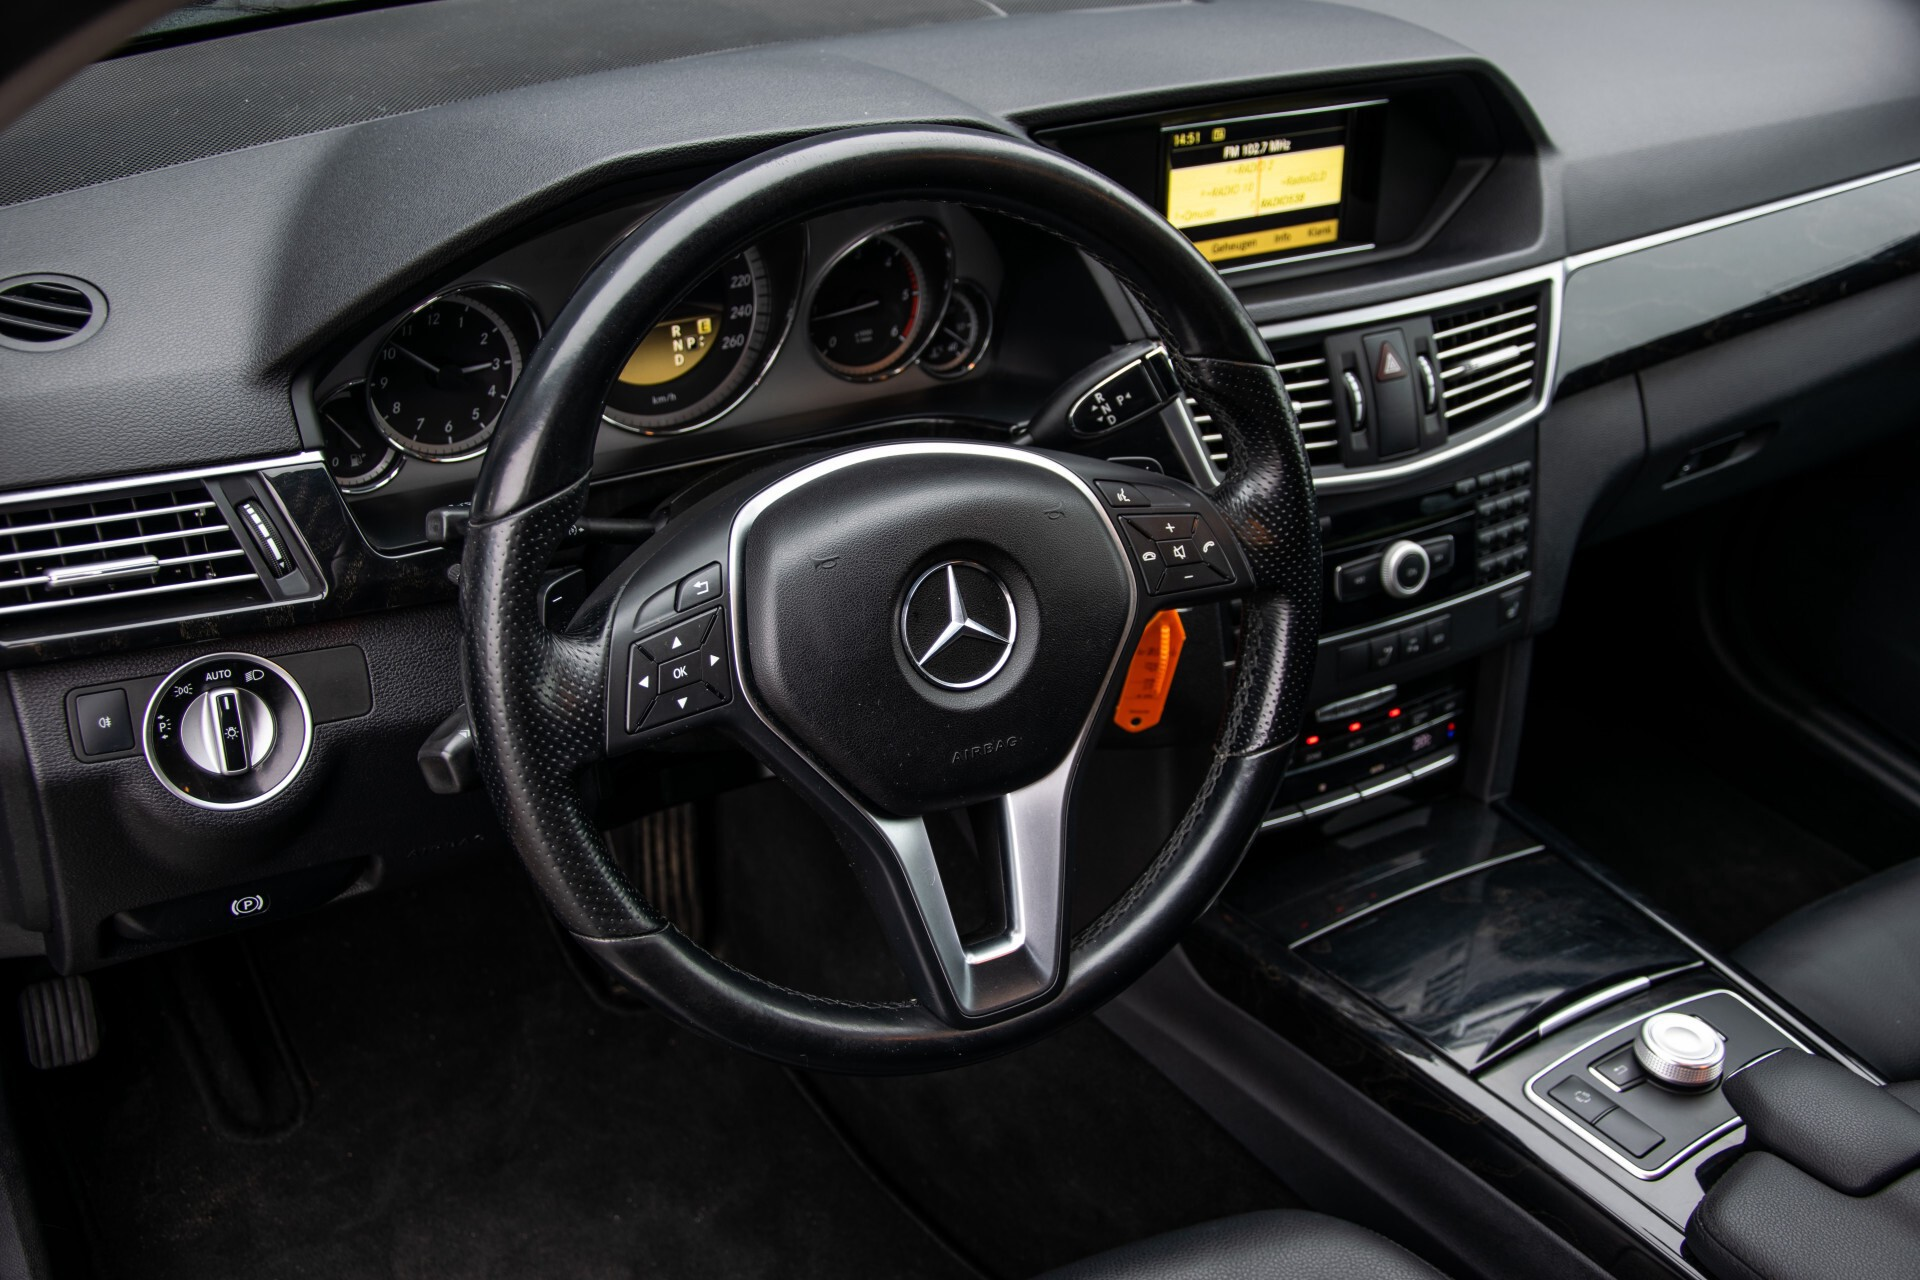 "Mercedes-Benz E-Klasse Estate 220 Cdi Avantgarde Wegklapbare trekhaak/18""/Privacyglas Aut7 Foto 11"